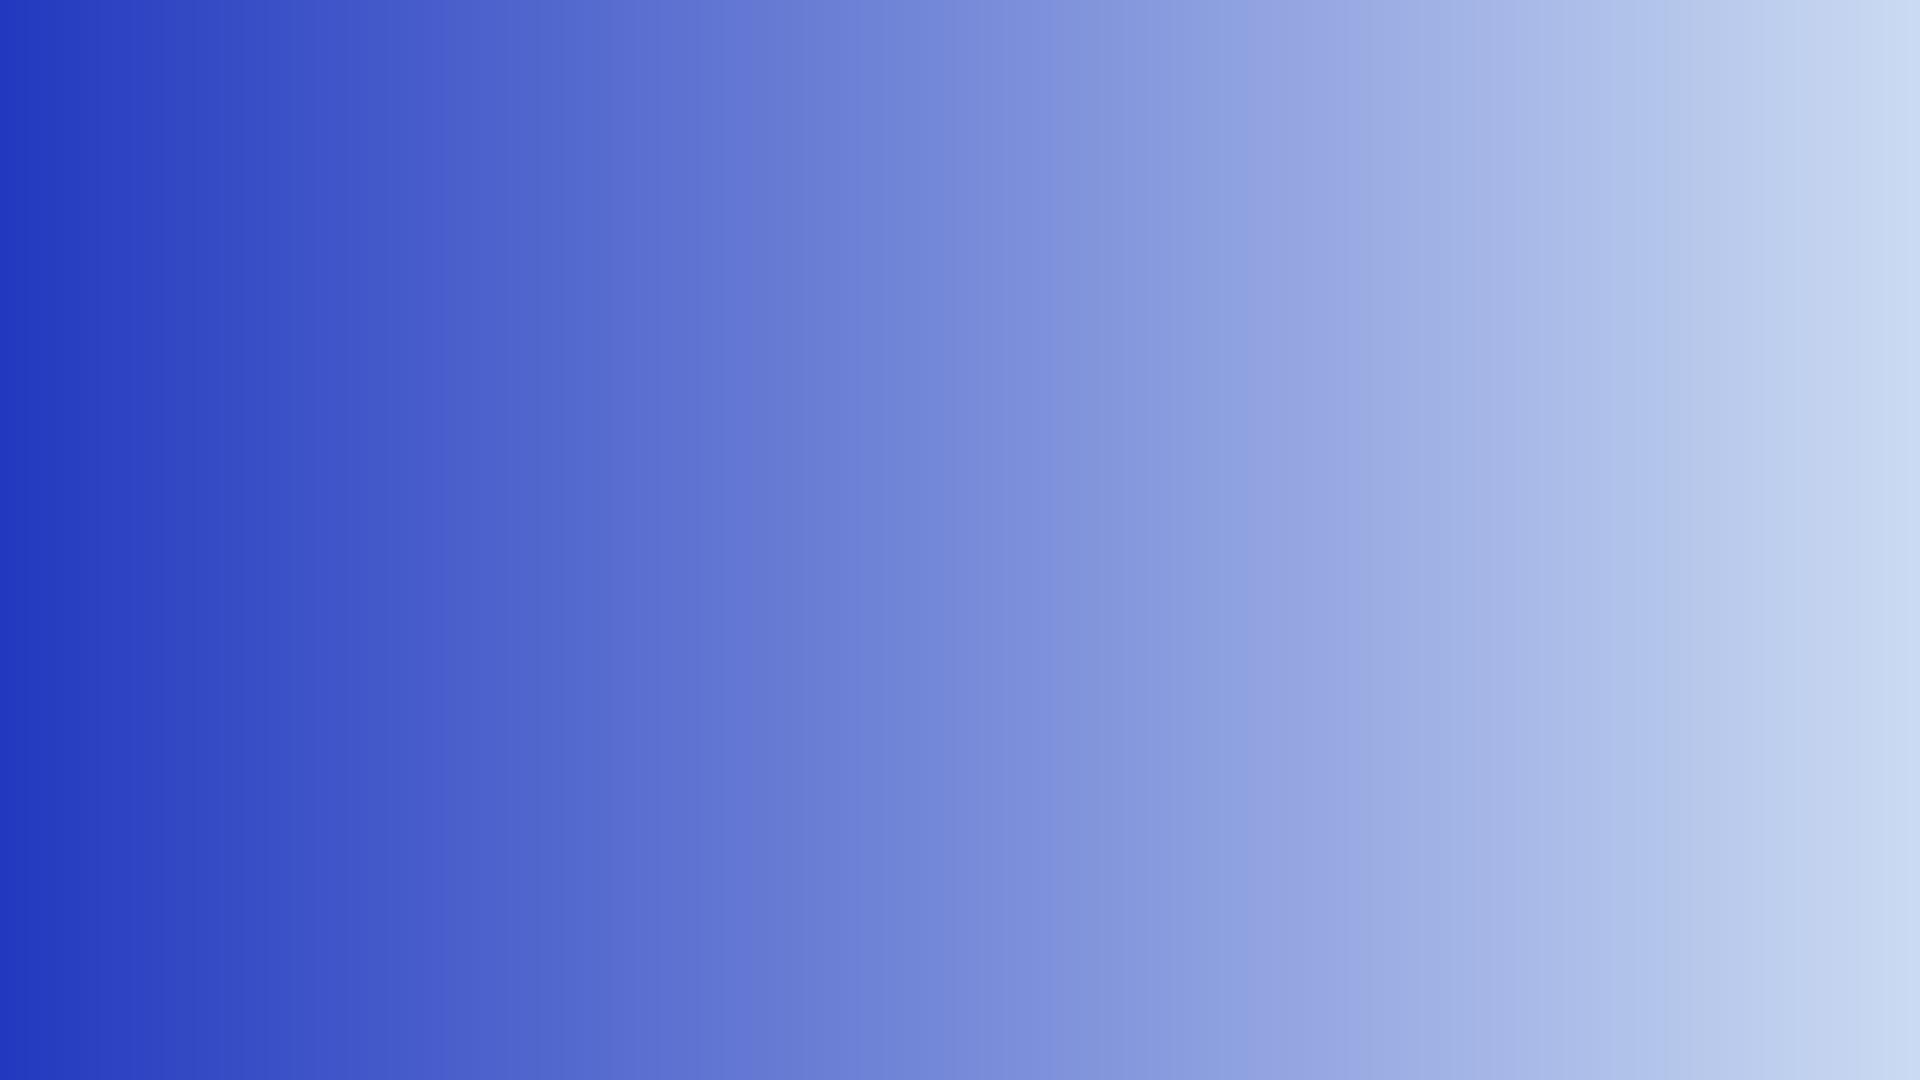 Blue Hex Gradient Gradient